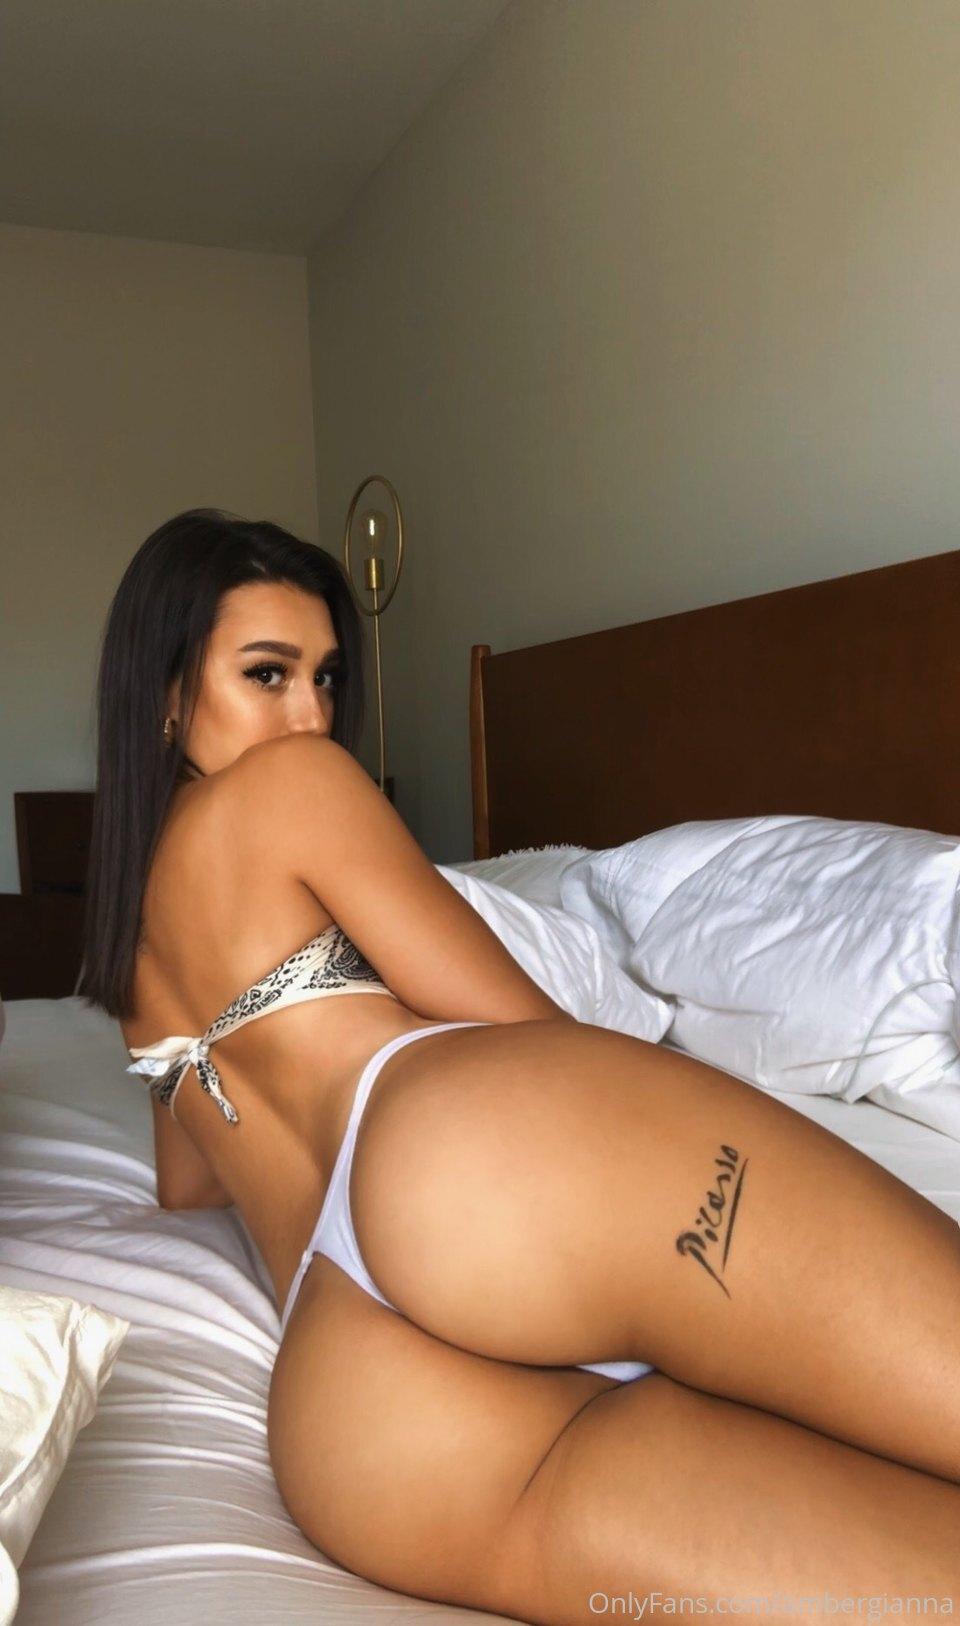 Amber Gianna Leaked 0134